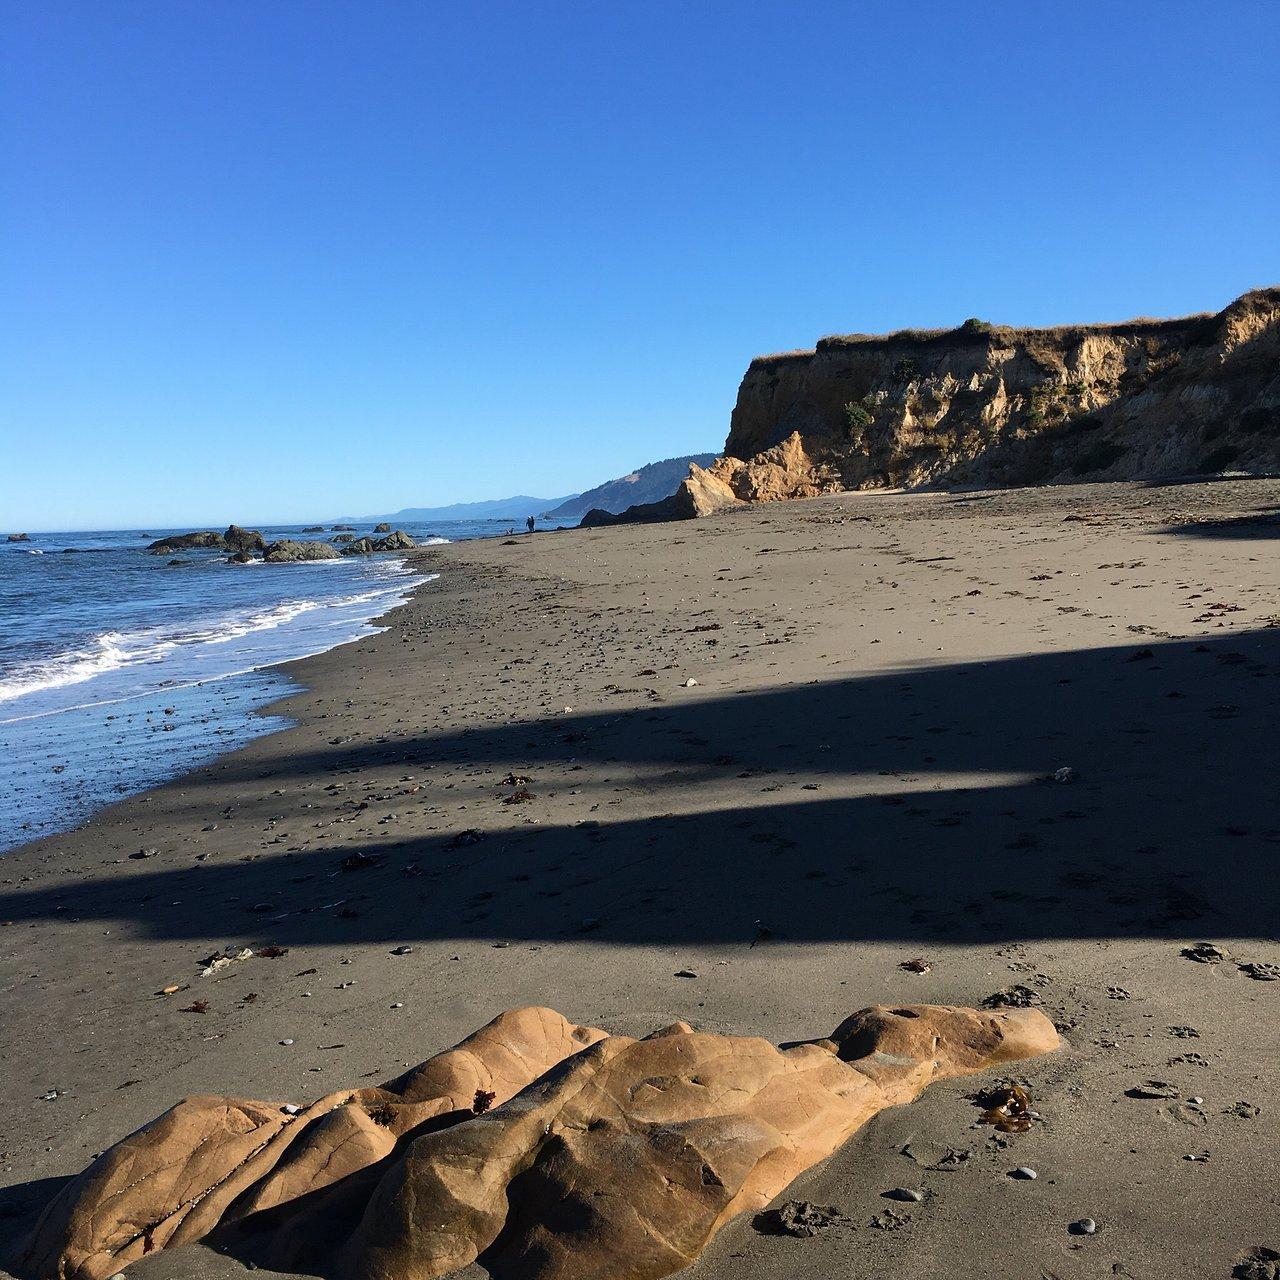 Casper Beach Rv Park Campground Updated 2018 Reviews Mendocino Ca Tripadvisor